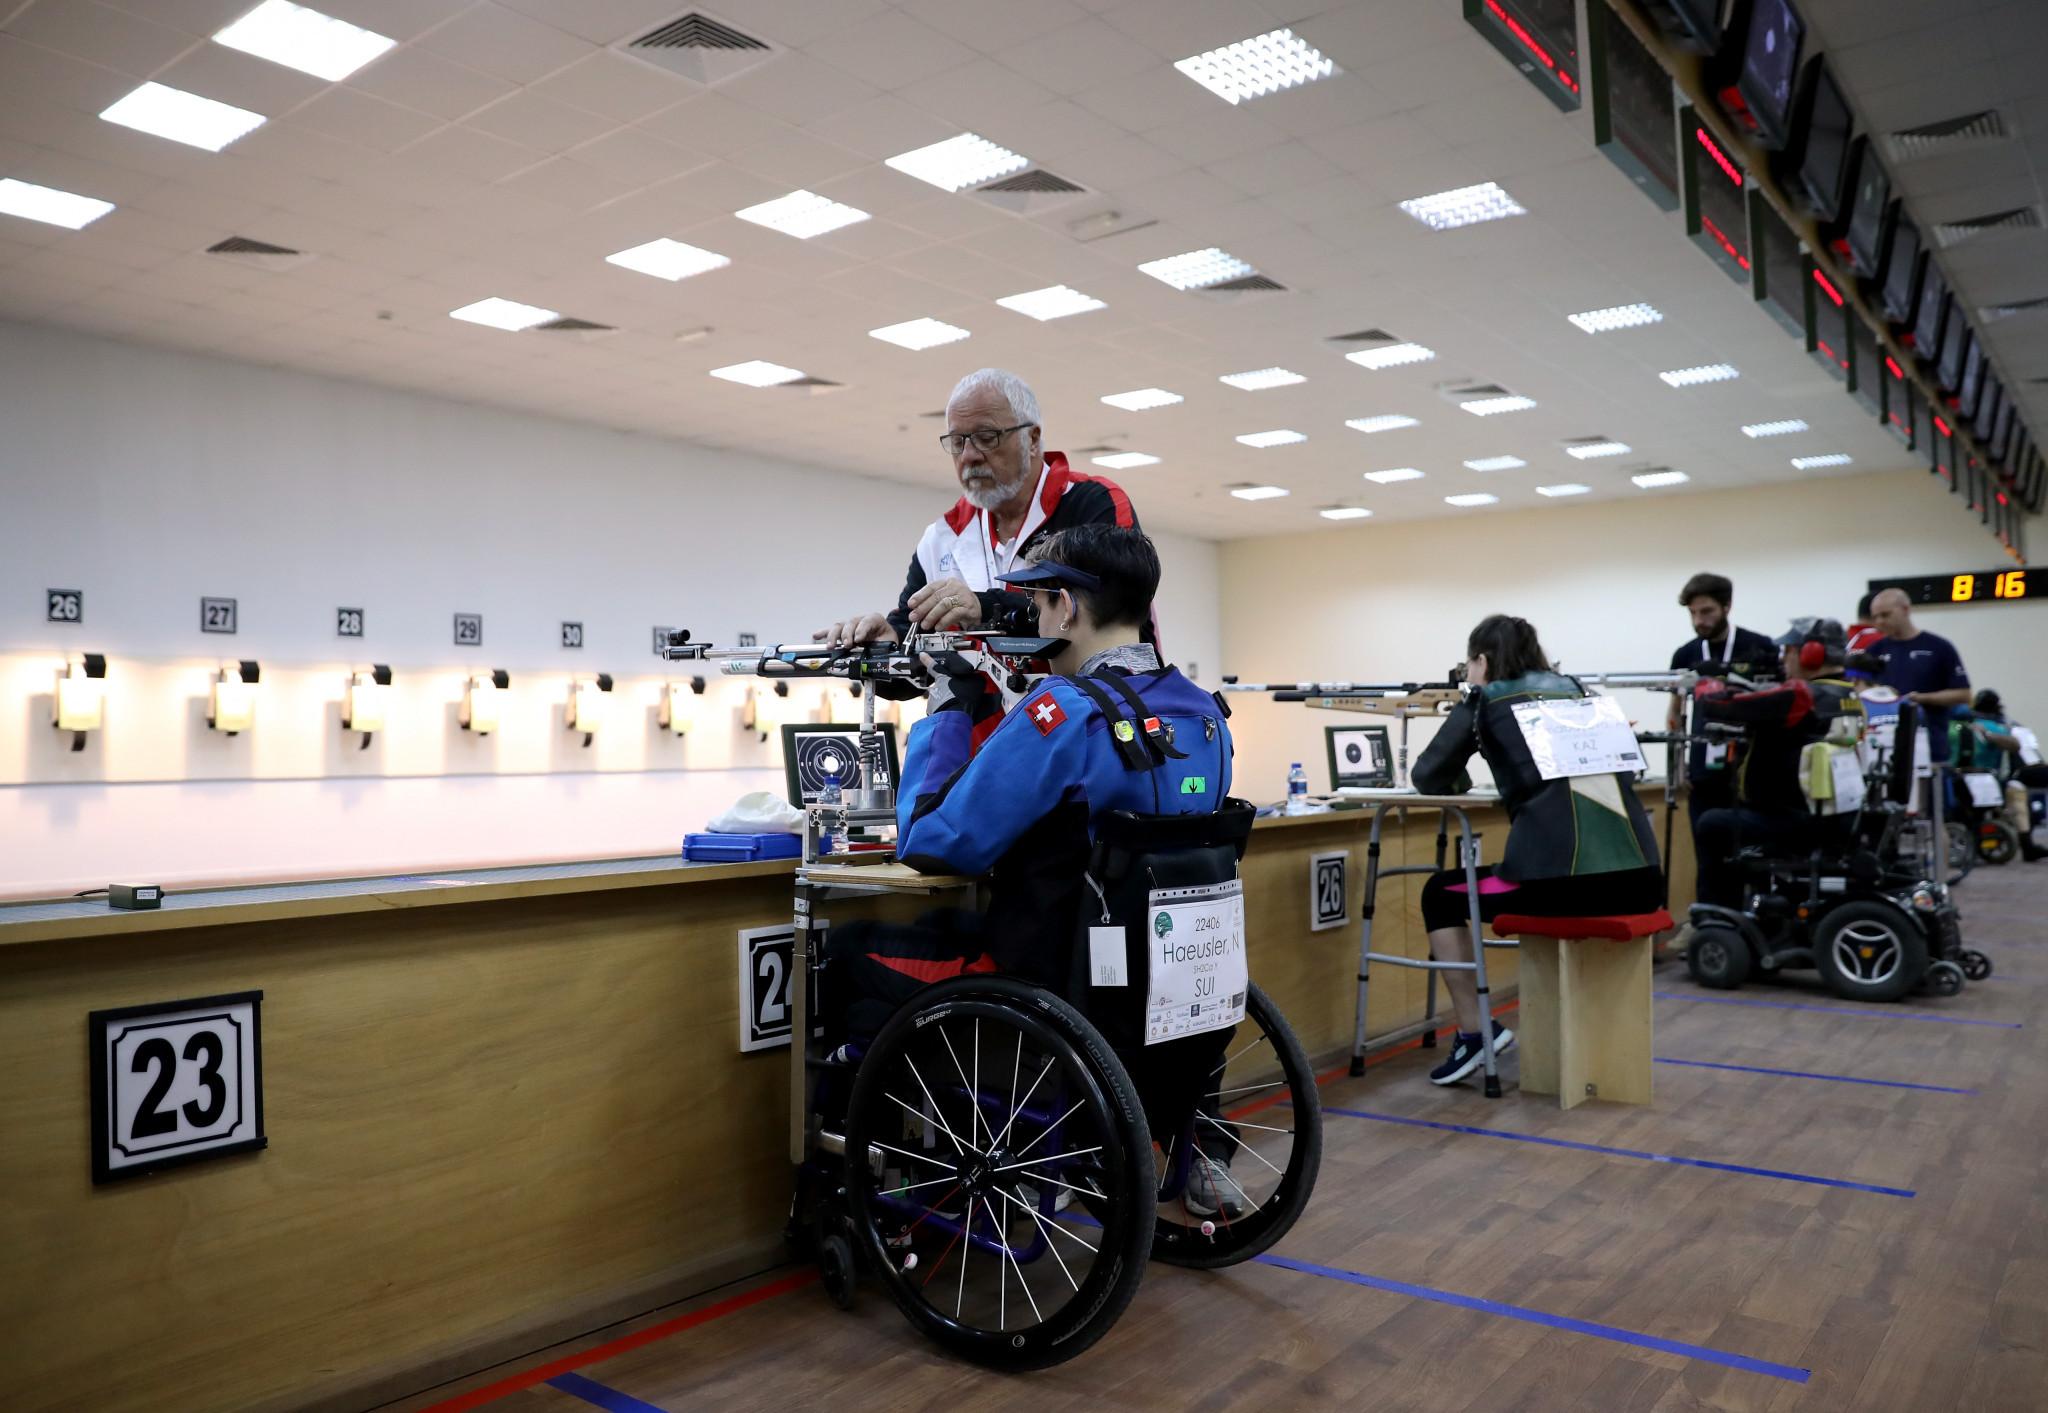 Sydney awarded 2019 World Shooting Para Sport World Championships